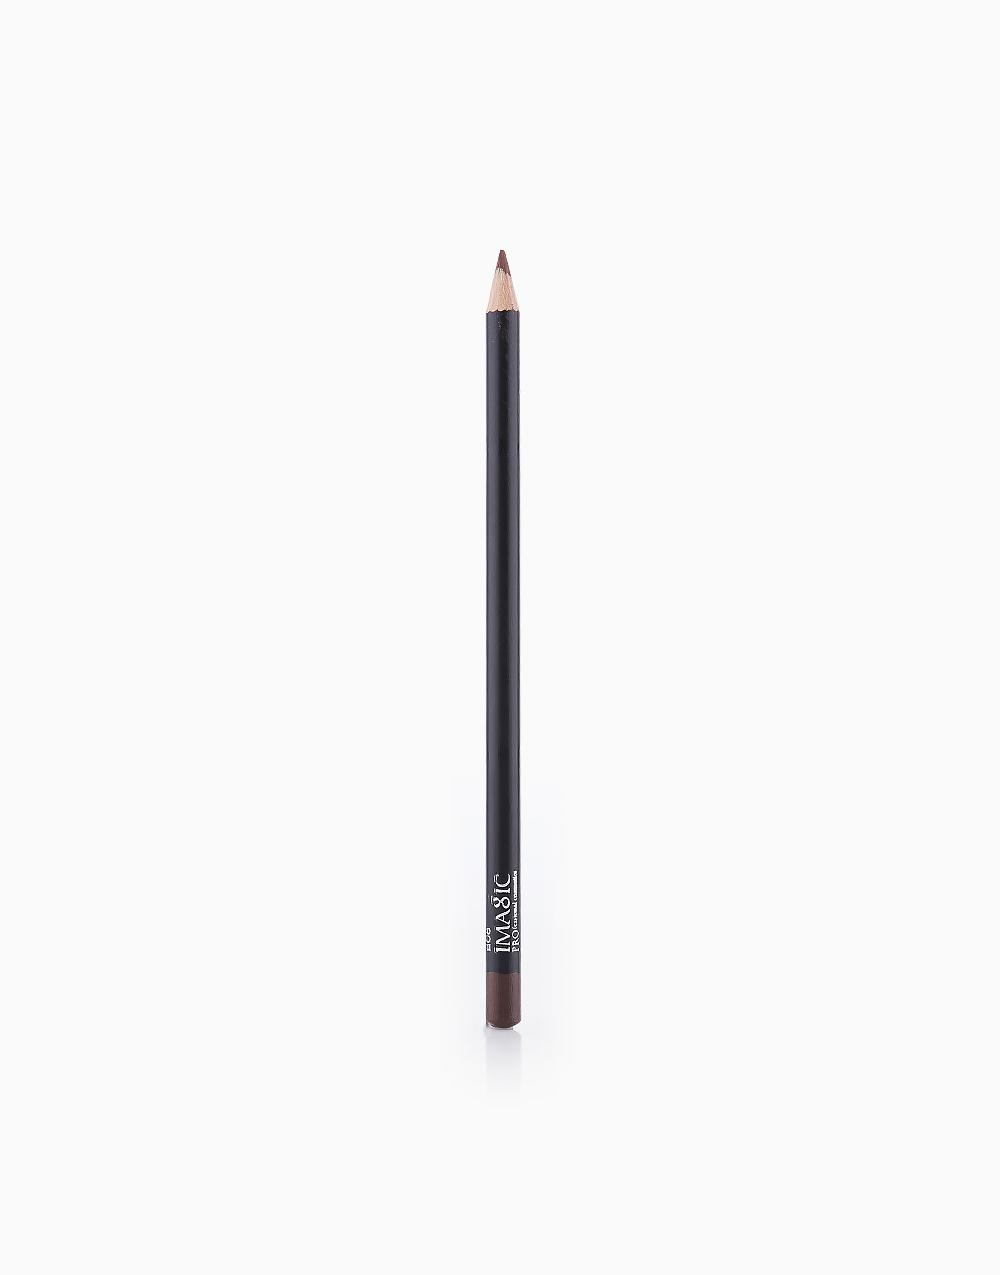 Beauty Pencil Eyeliner  by Imagic | 05 Medium Brown